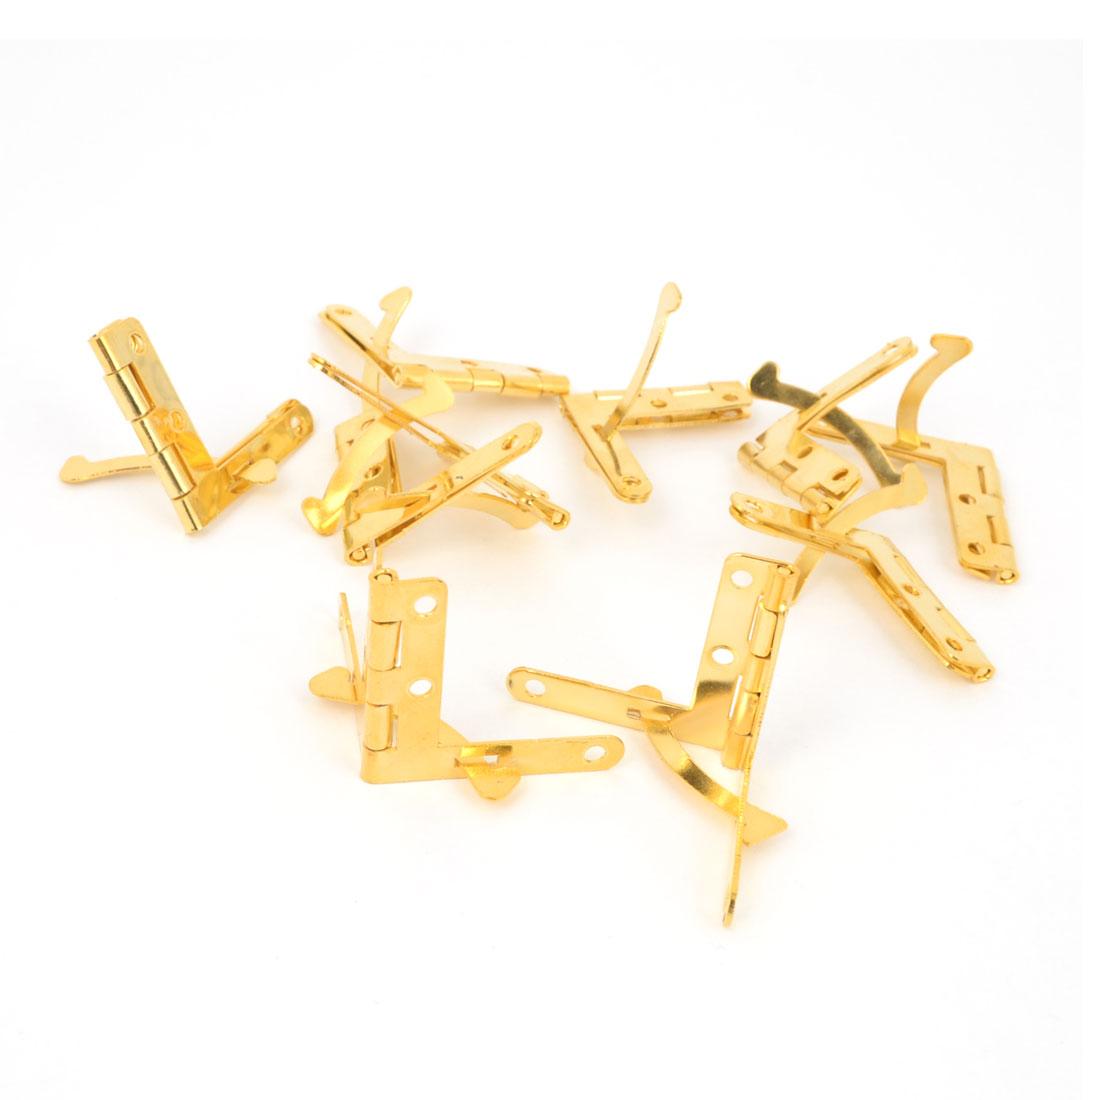 10 Pcs Gold Tone Metal Foldable Closet Cabinet Door Corner Hinges